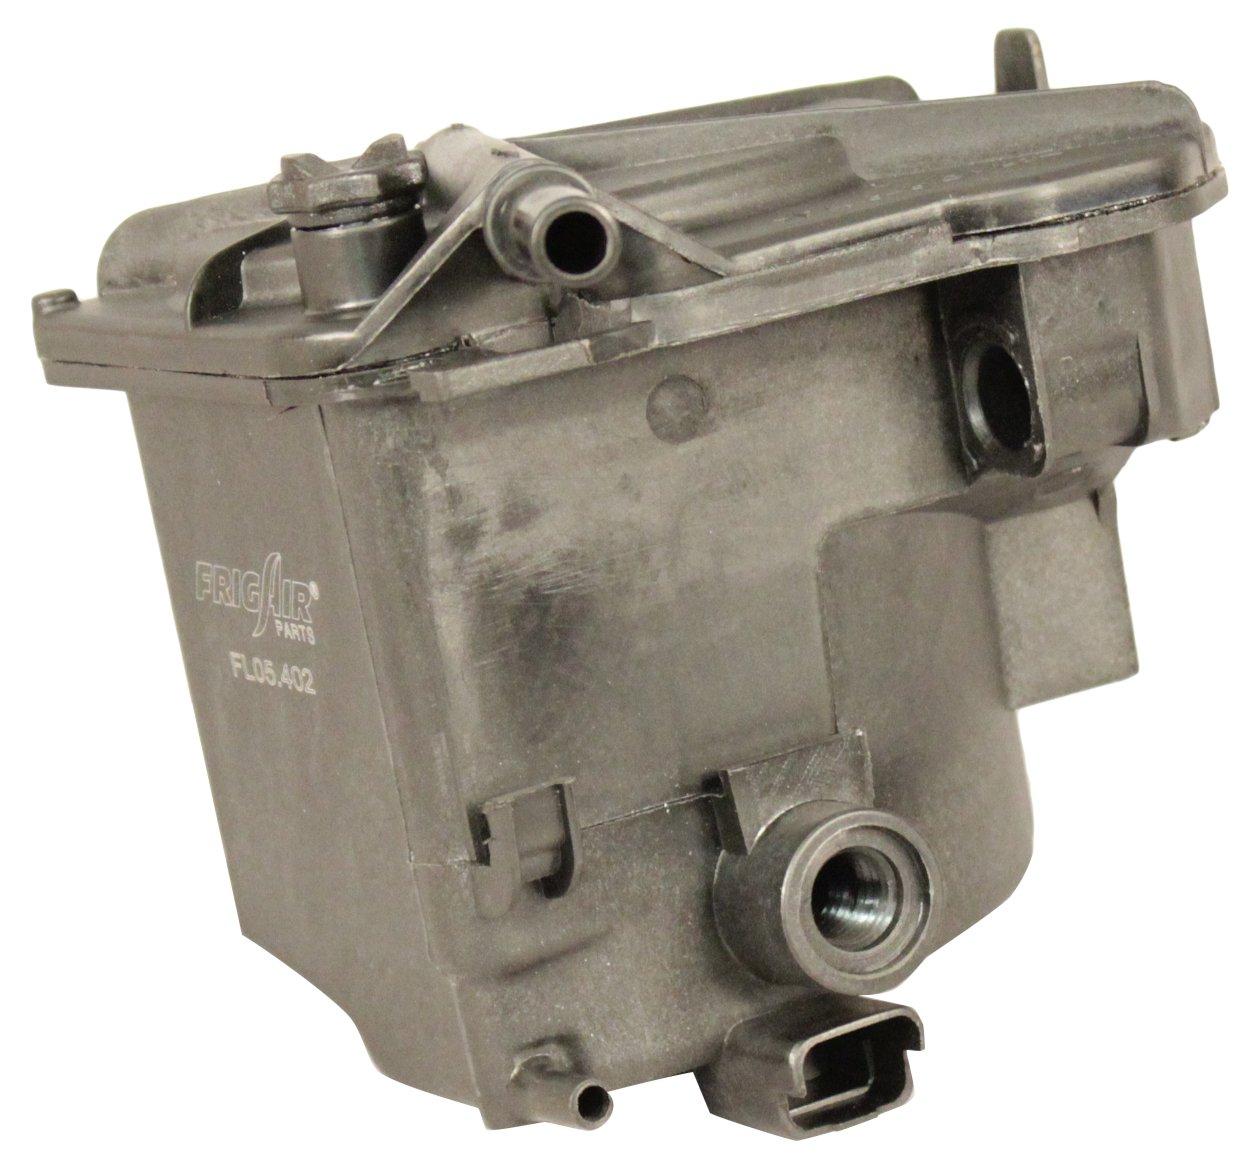 FRIGAIR fl05.402/Filtre /à carburant